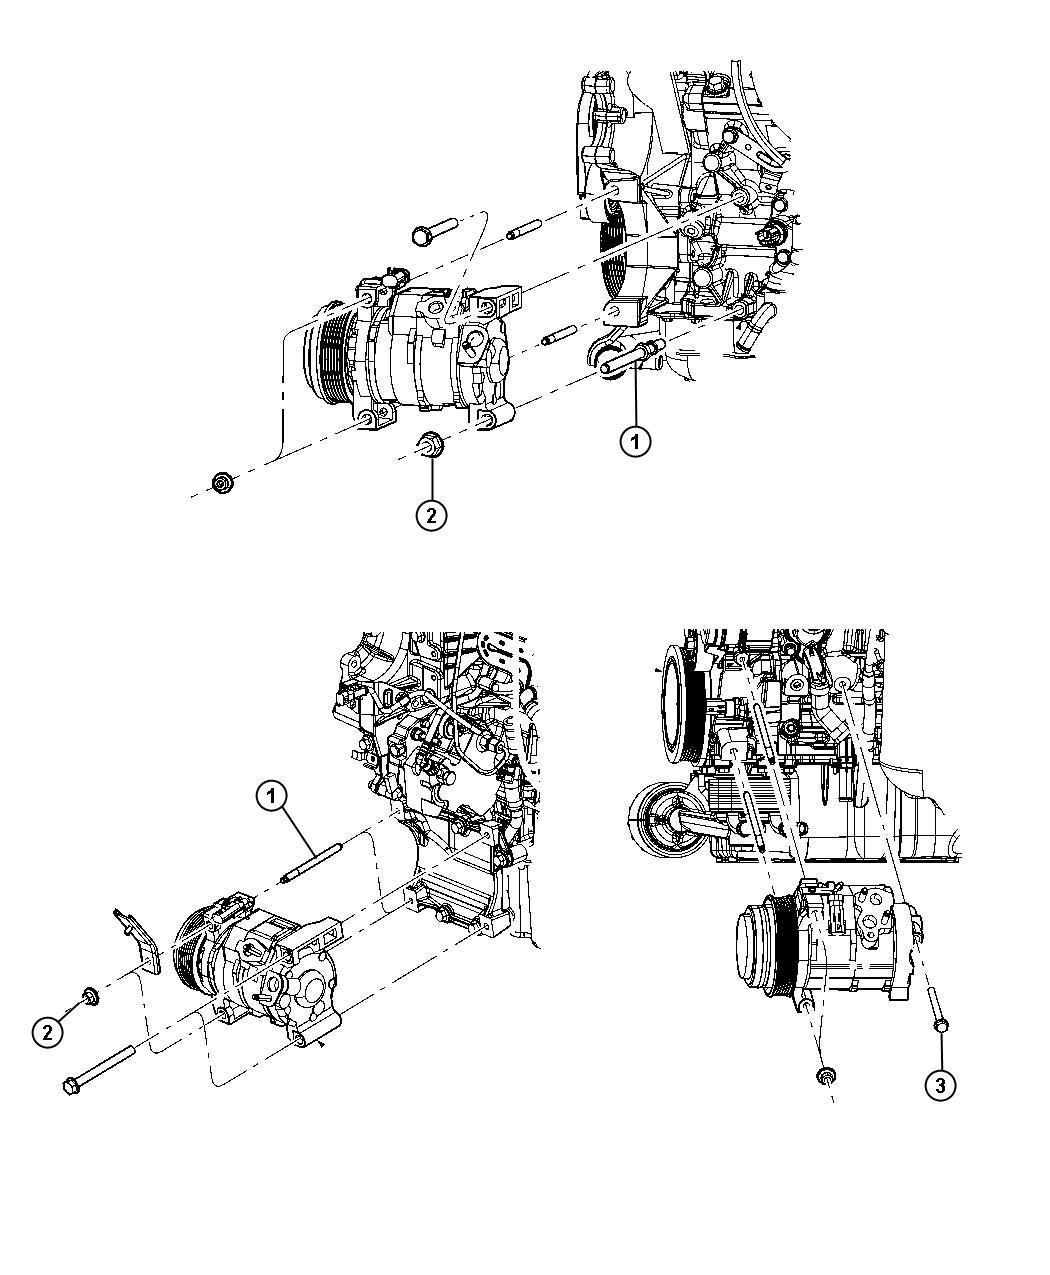 2015 Dodge Charger HELLCAT 6.2L SuperCharged V8 Stud